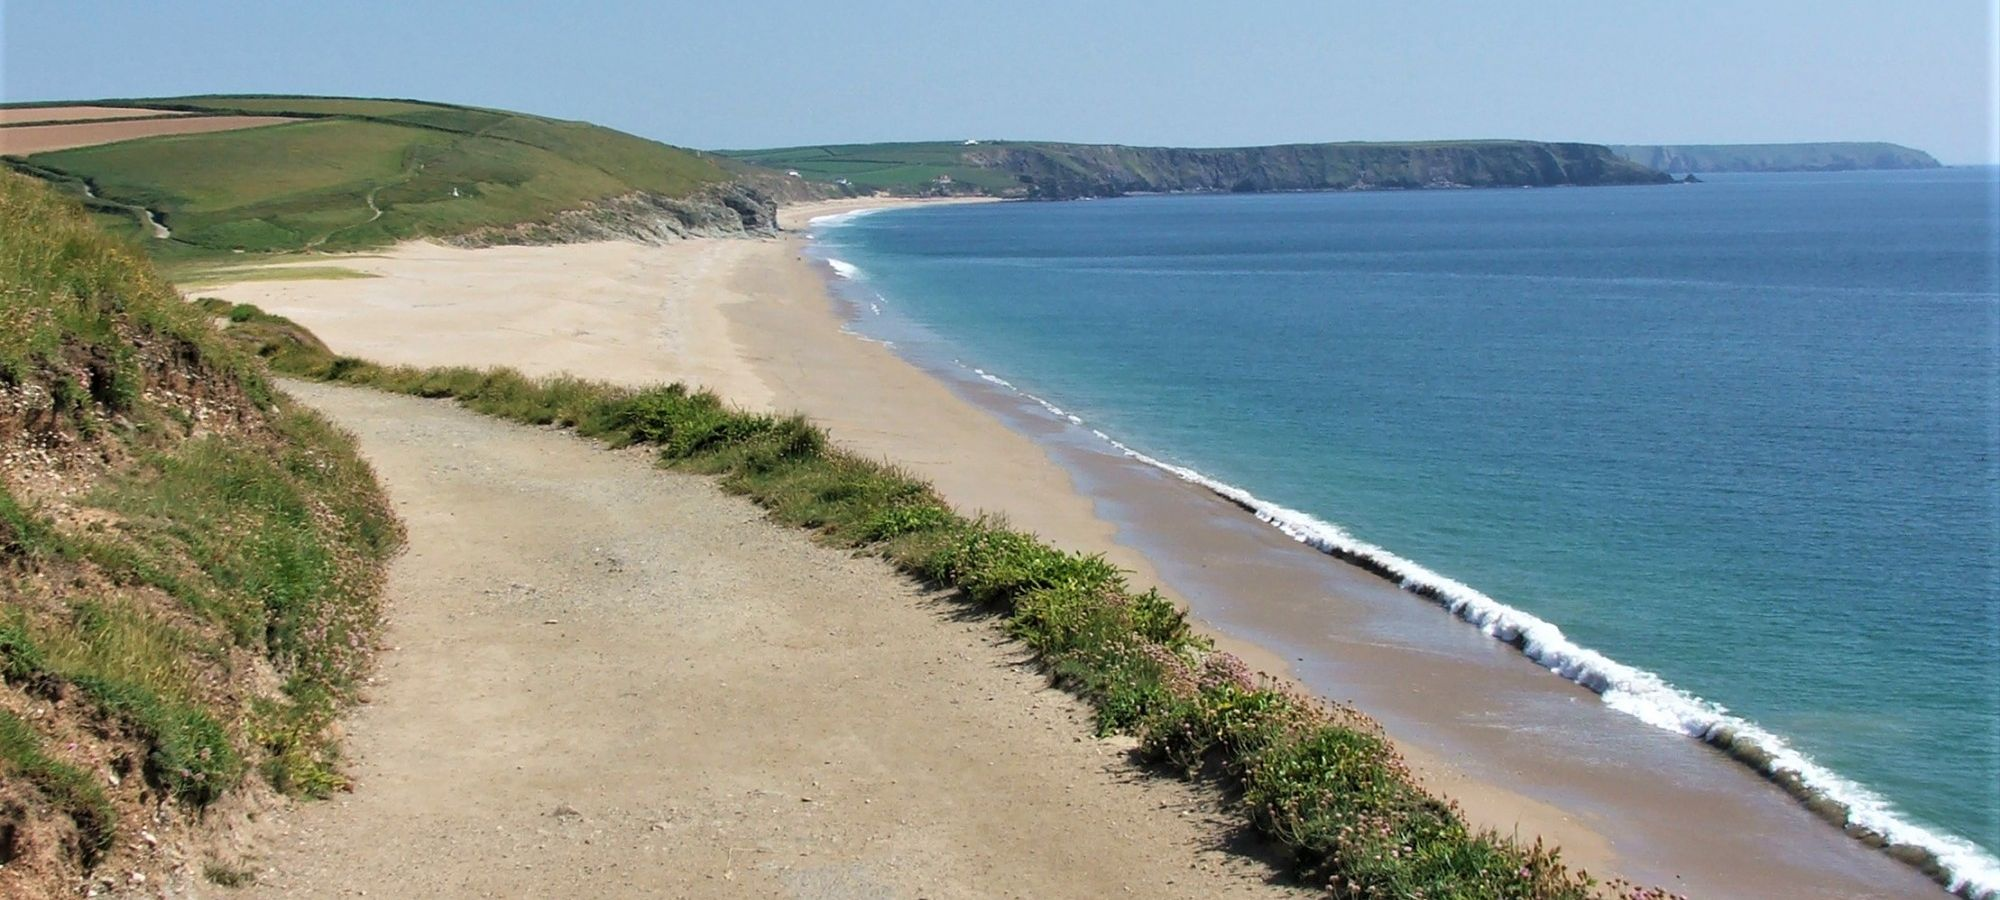 loe Bar beach, Porthleven, Cornwall